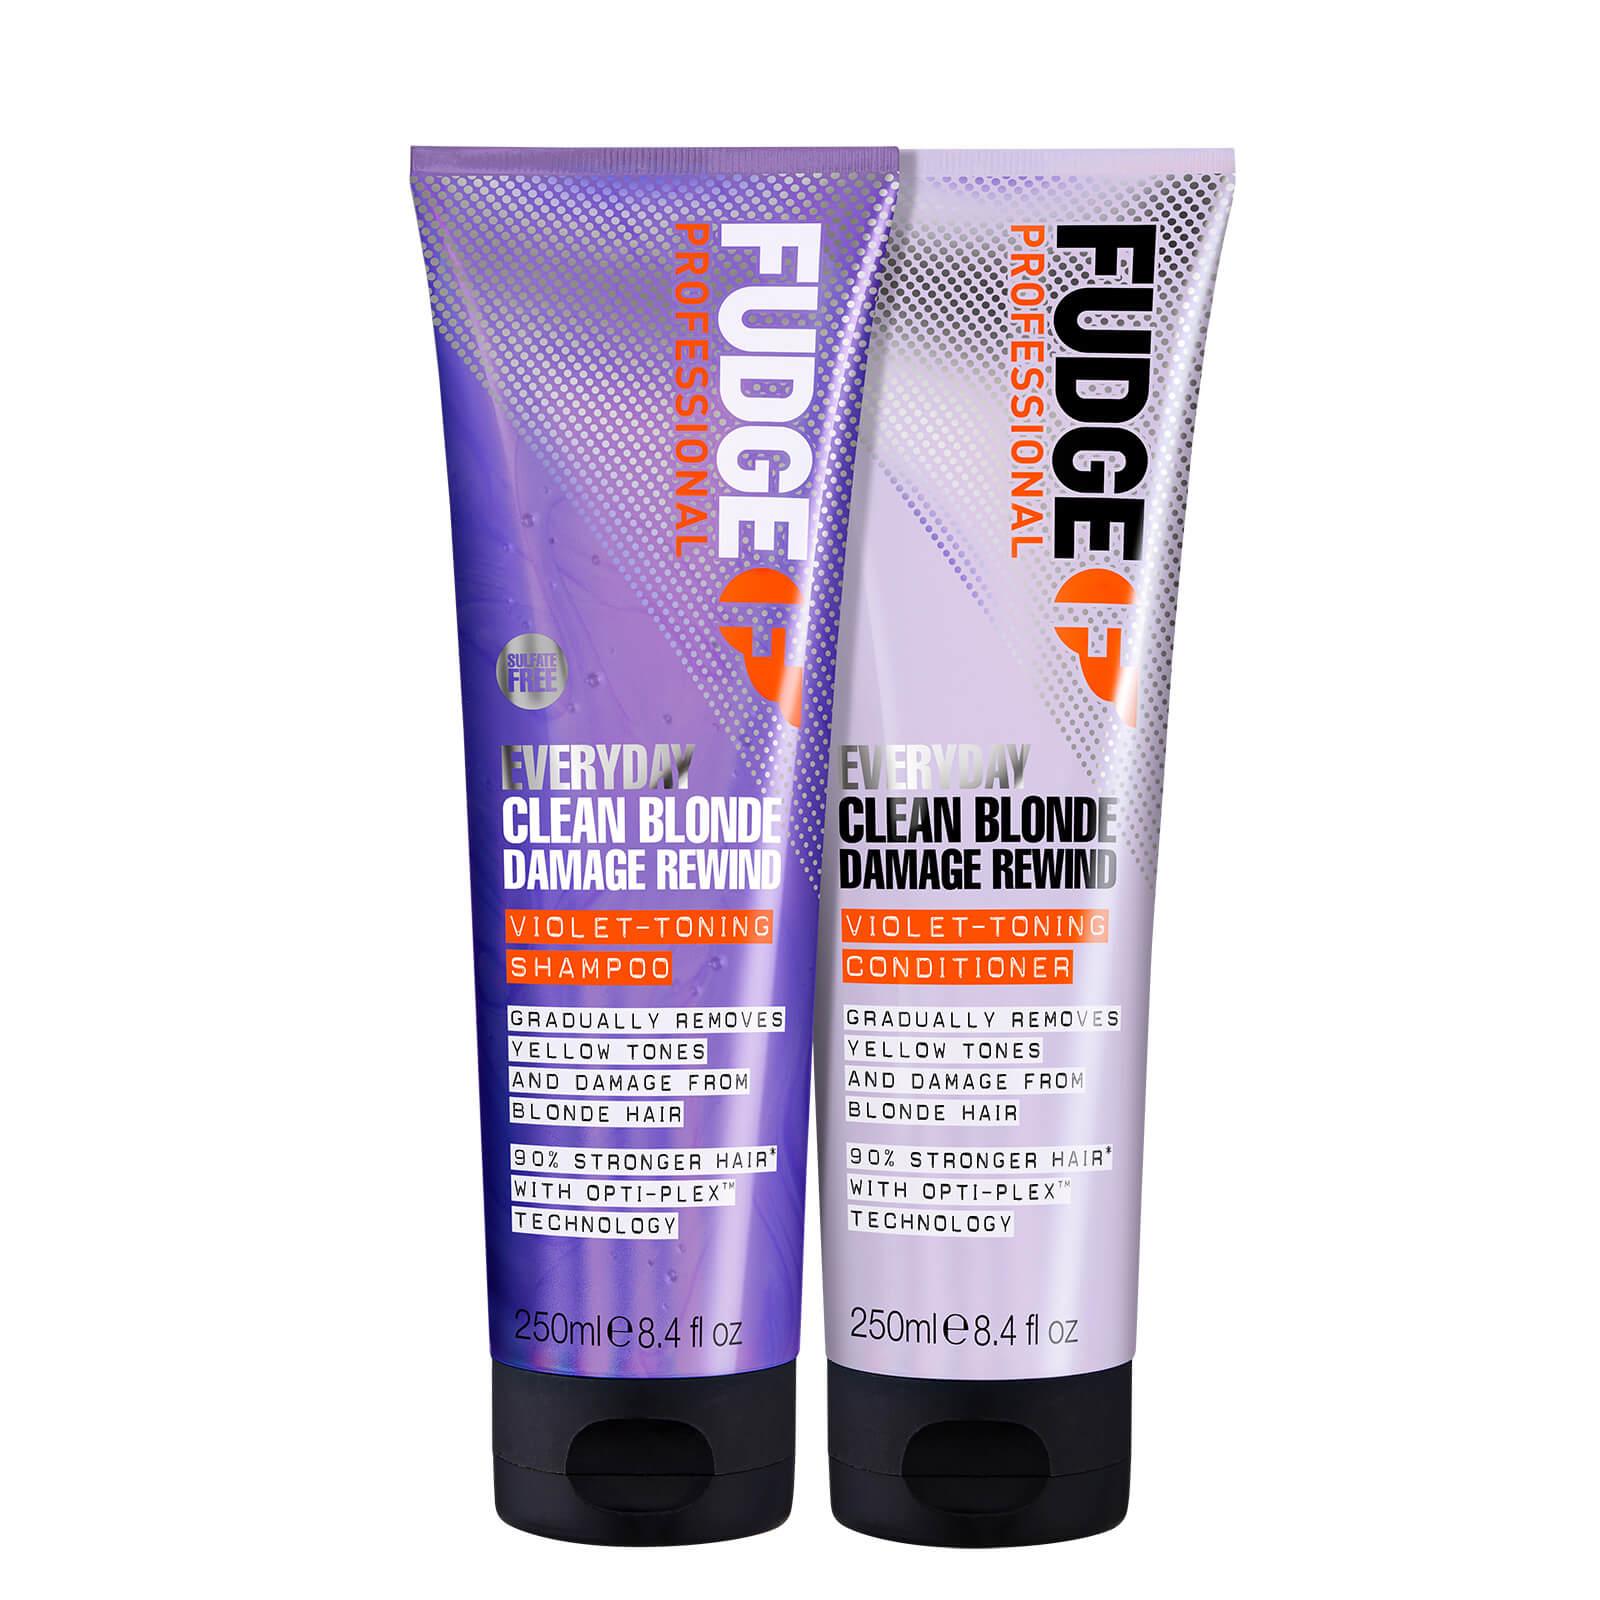 Купить Fudge Professional Clean Blonde Everyday Violet Damage Rewind Purple Shampoo and Conditioner Duo